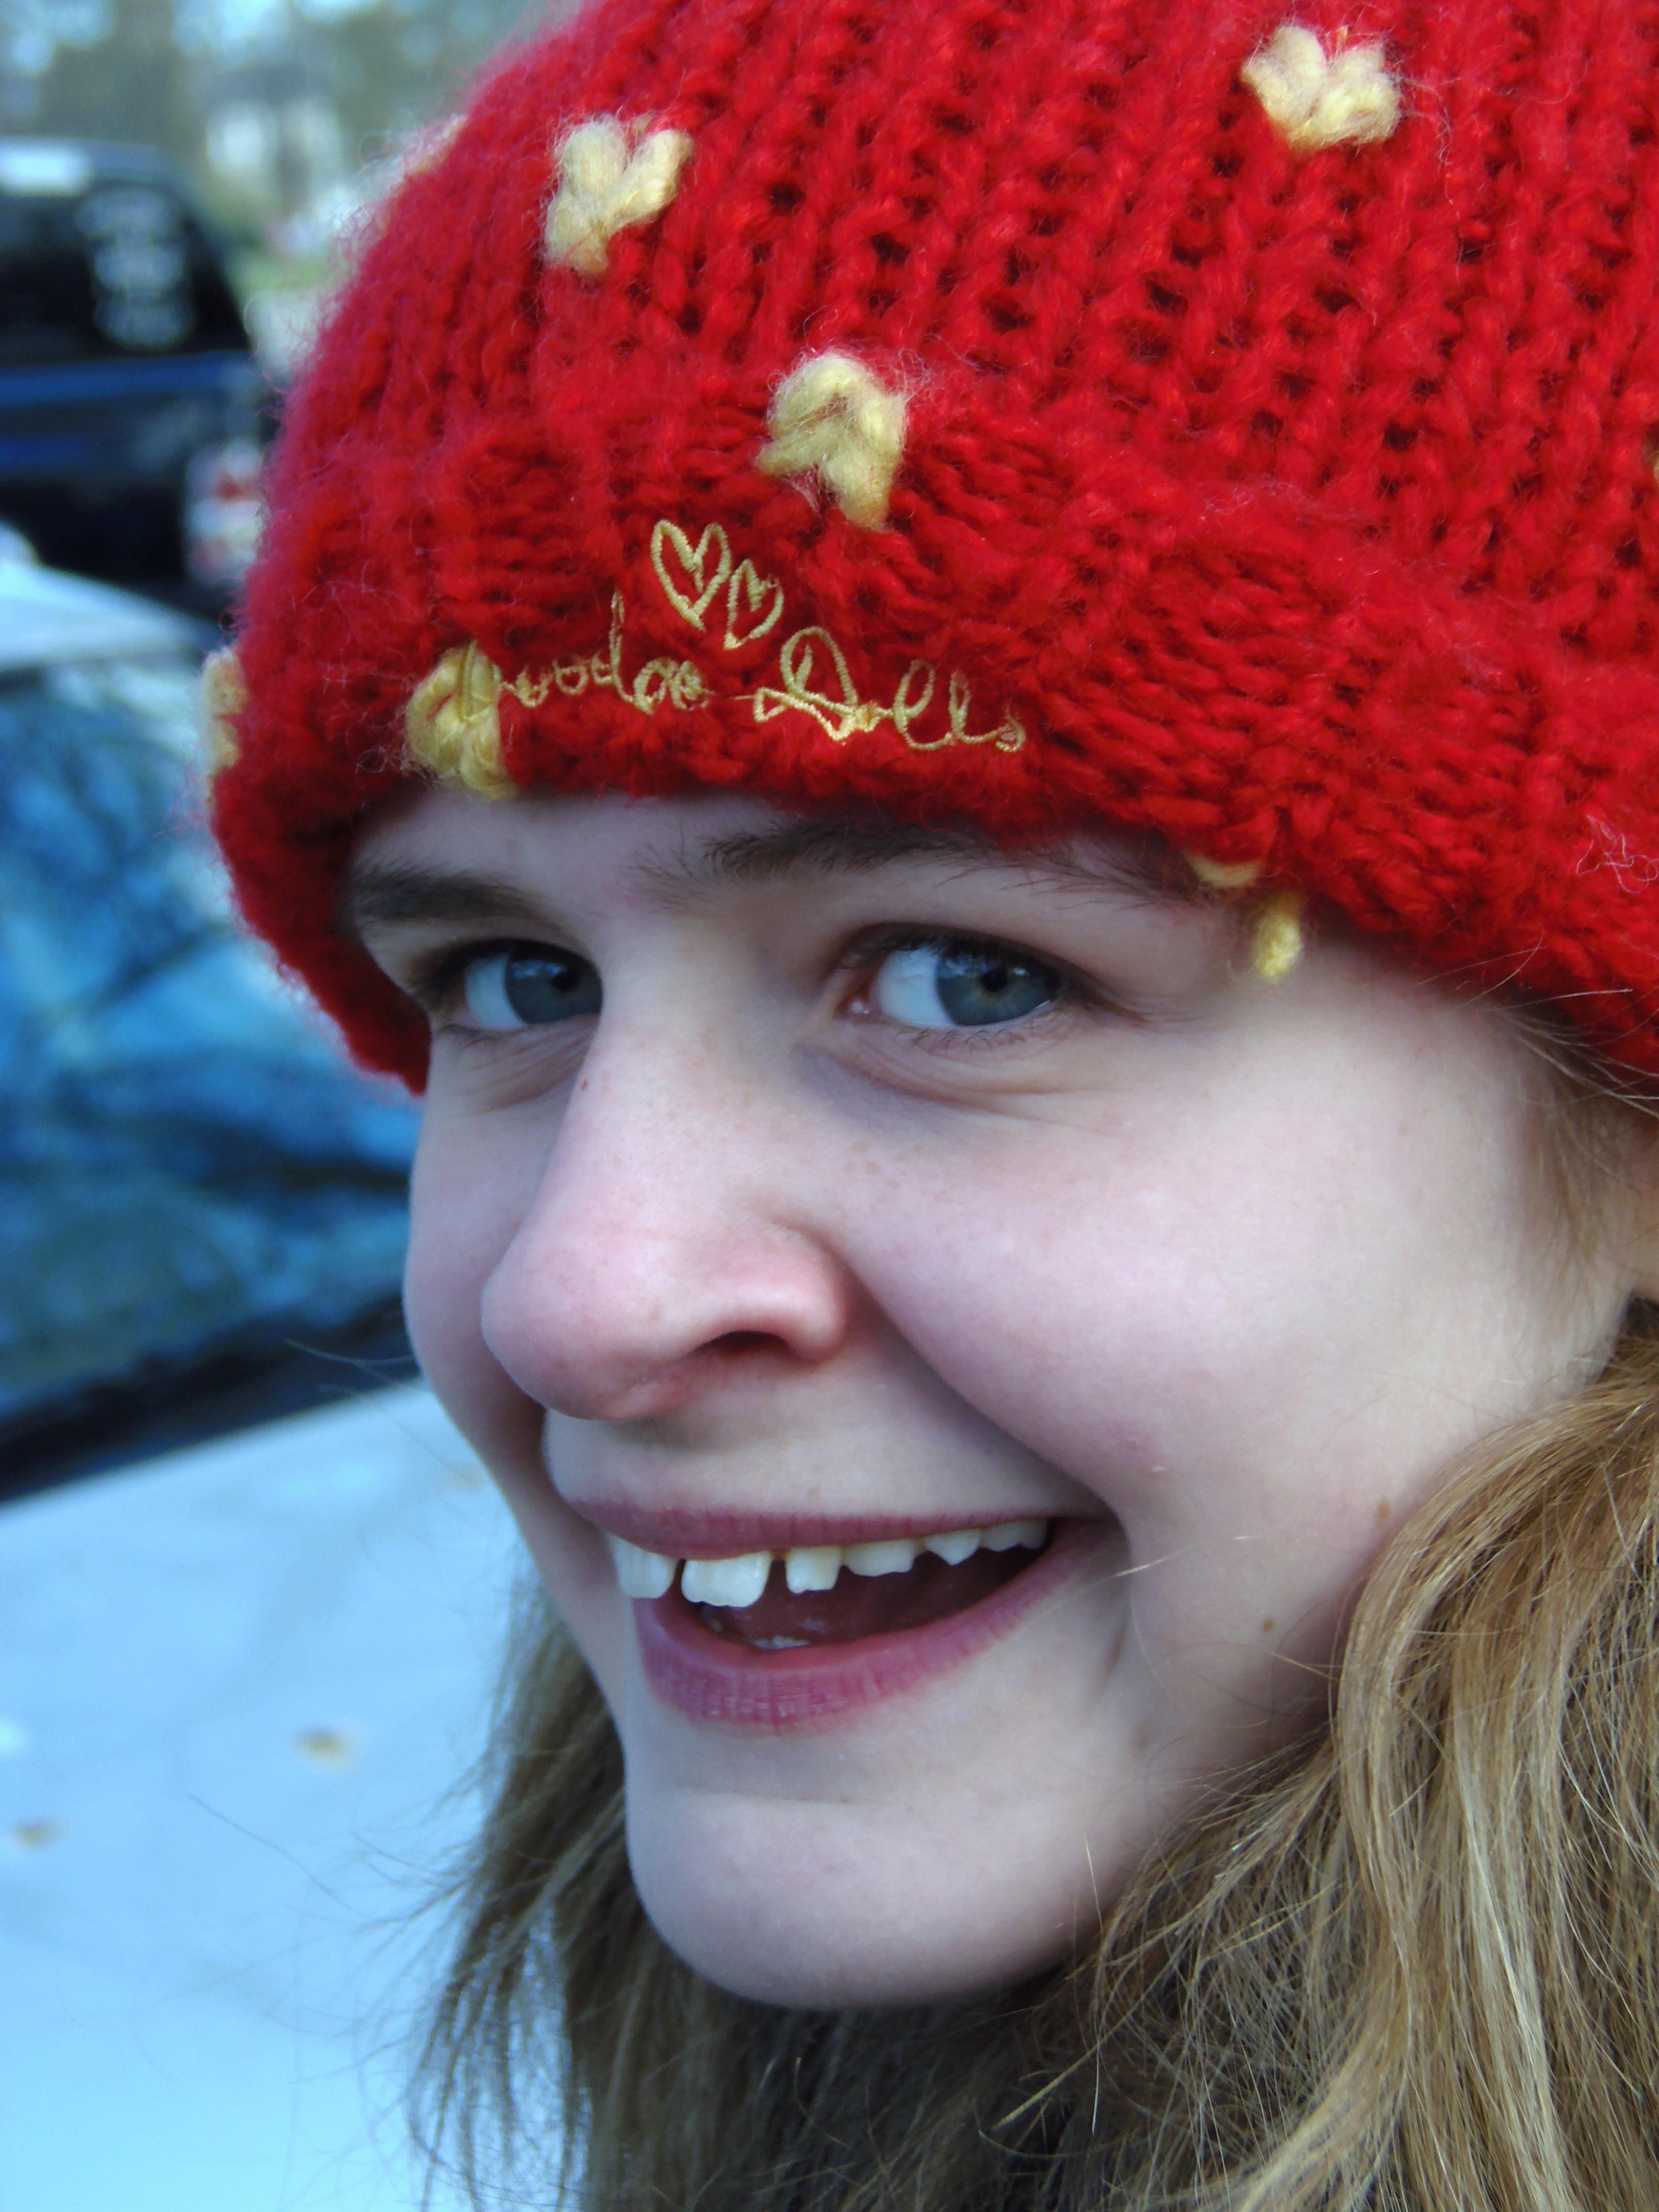 Fotos gratis : niña, hembra, retrato, rojo, niño, sombrero, ropa ...